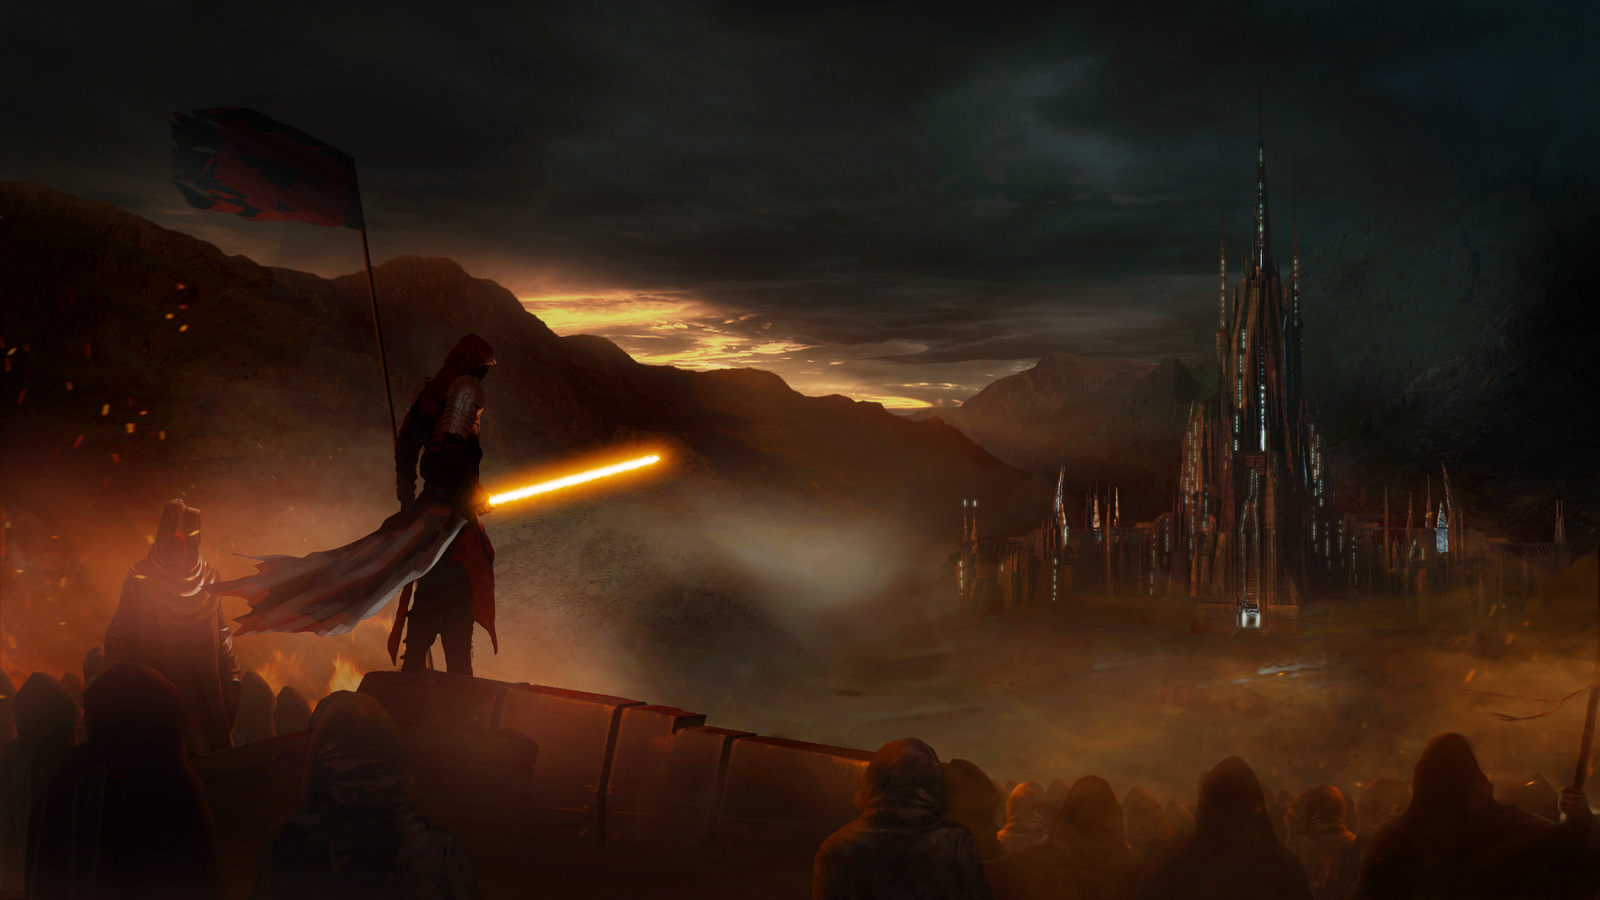 Star Wars Wallpaper 1600x900 Sith Banner